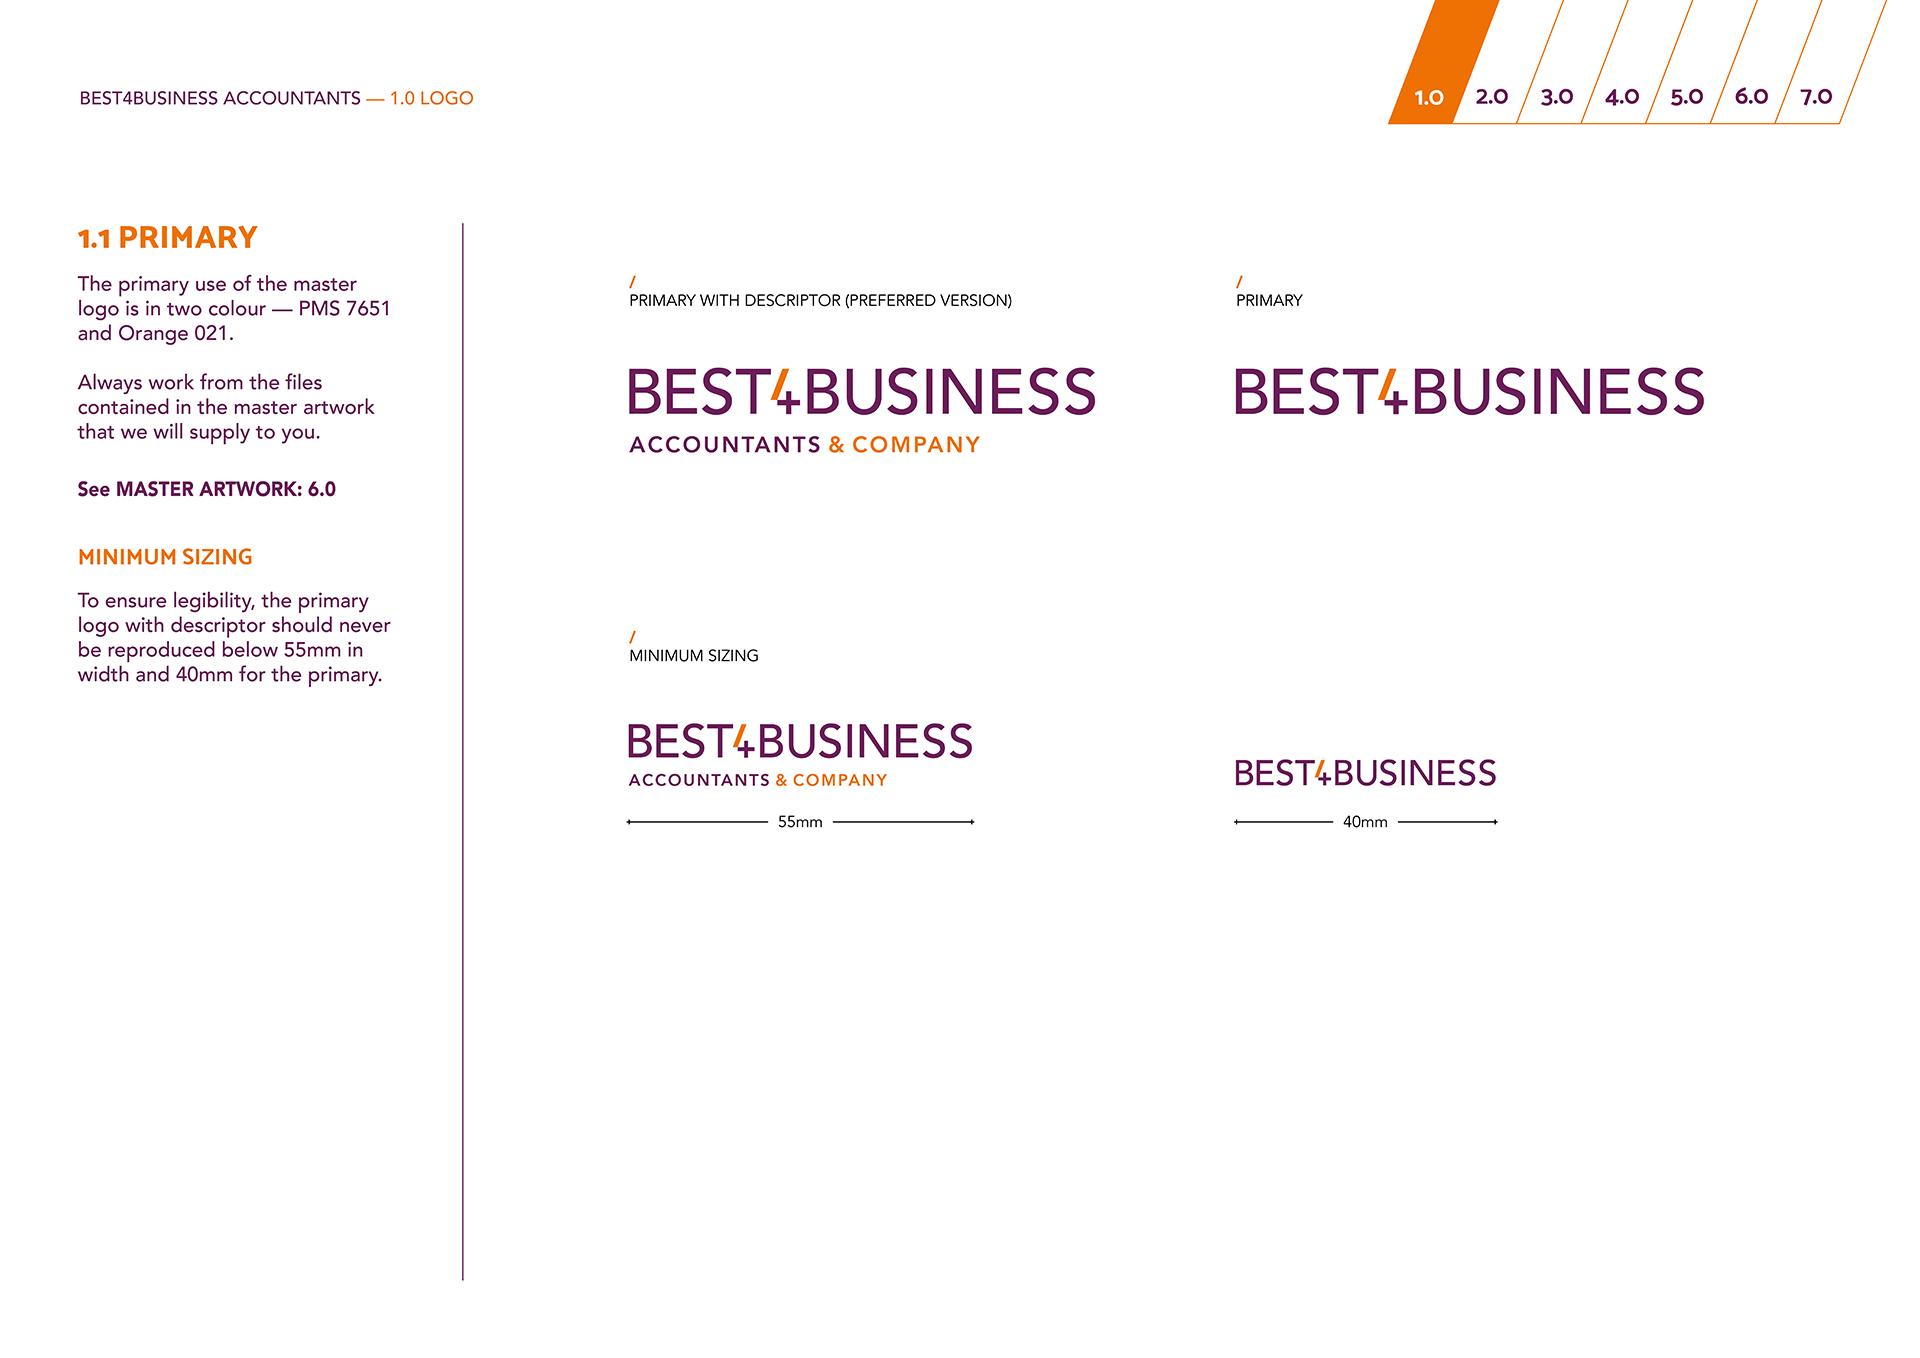 Best4business Accountants